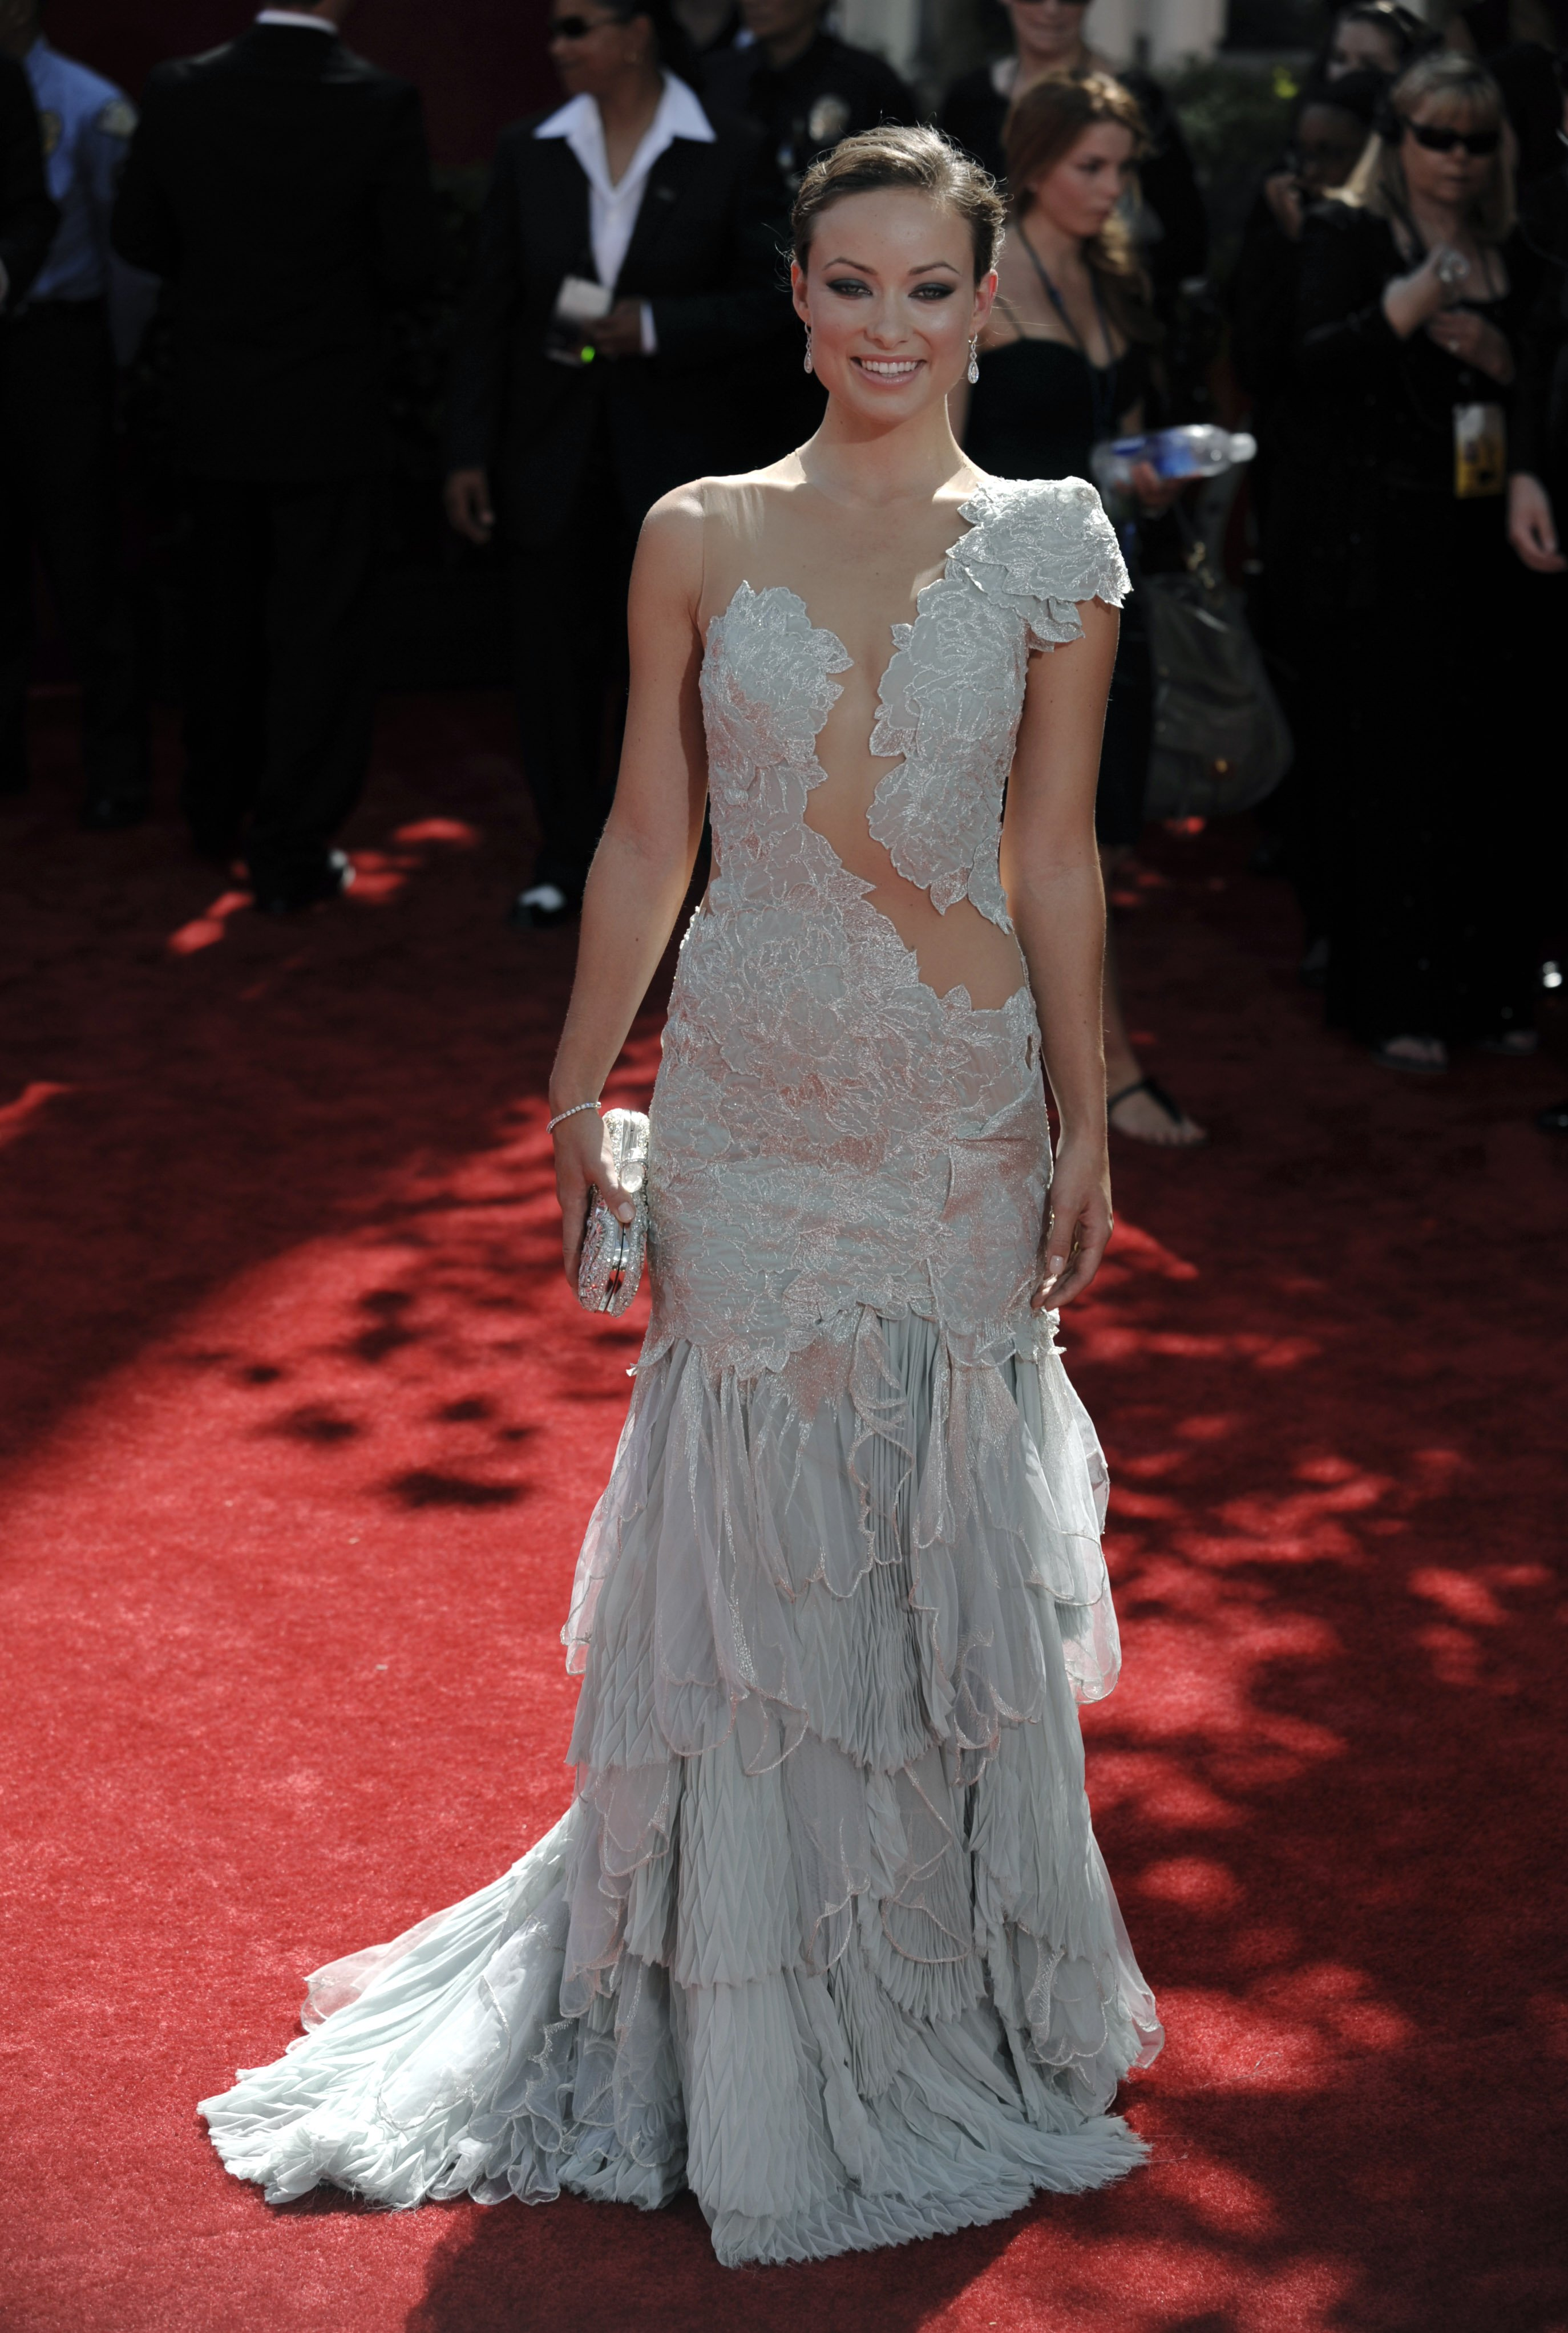 86712_Celebutopia-Olivia_Wilde_arrives_at_the_61st_Primetime_Emmy_Awards-07_122_448lo.jpg